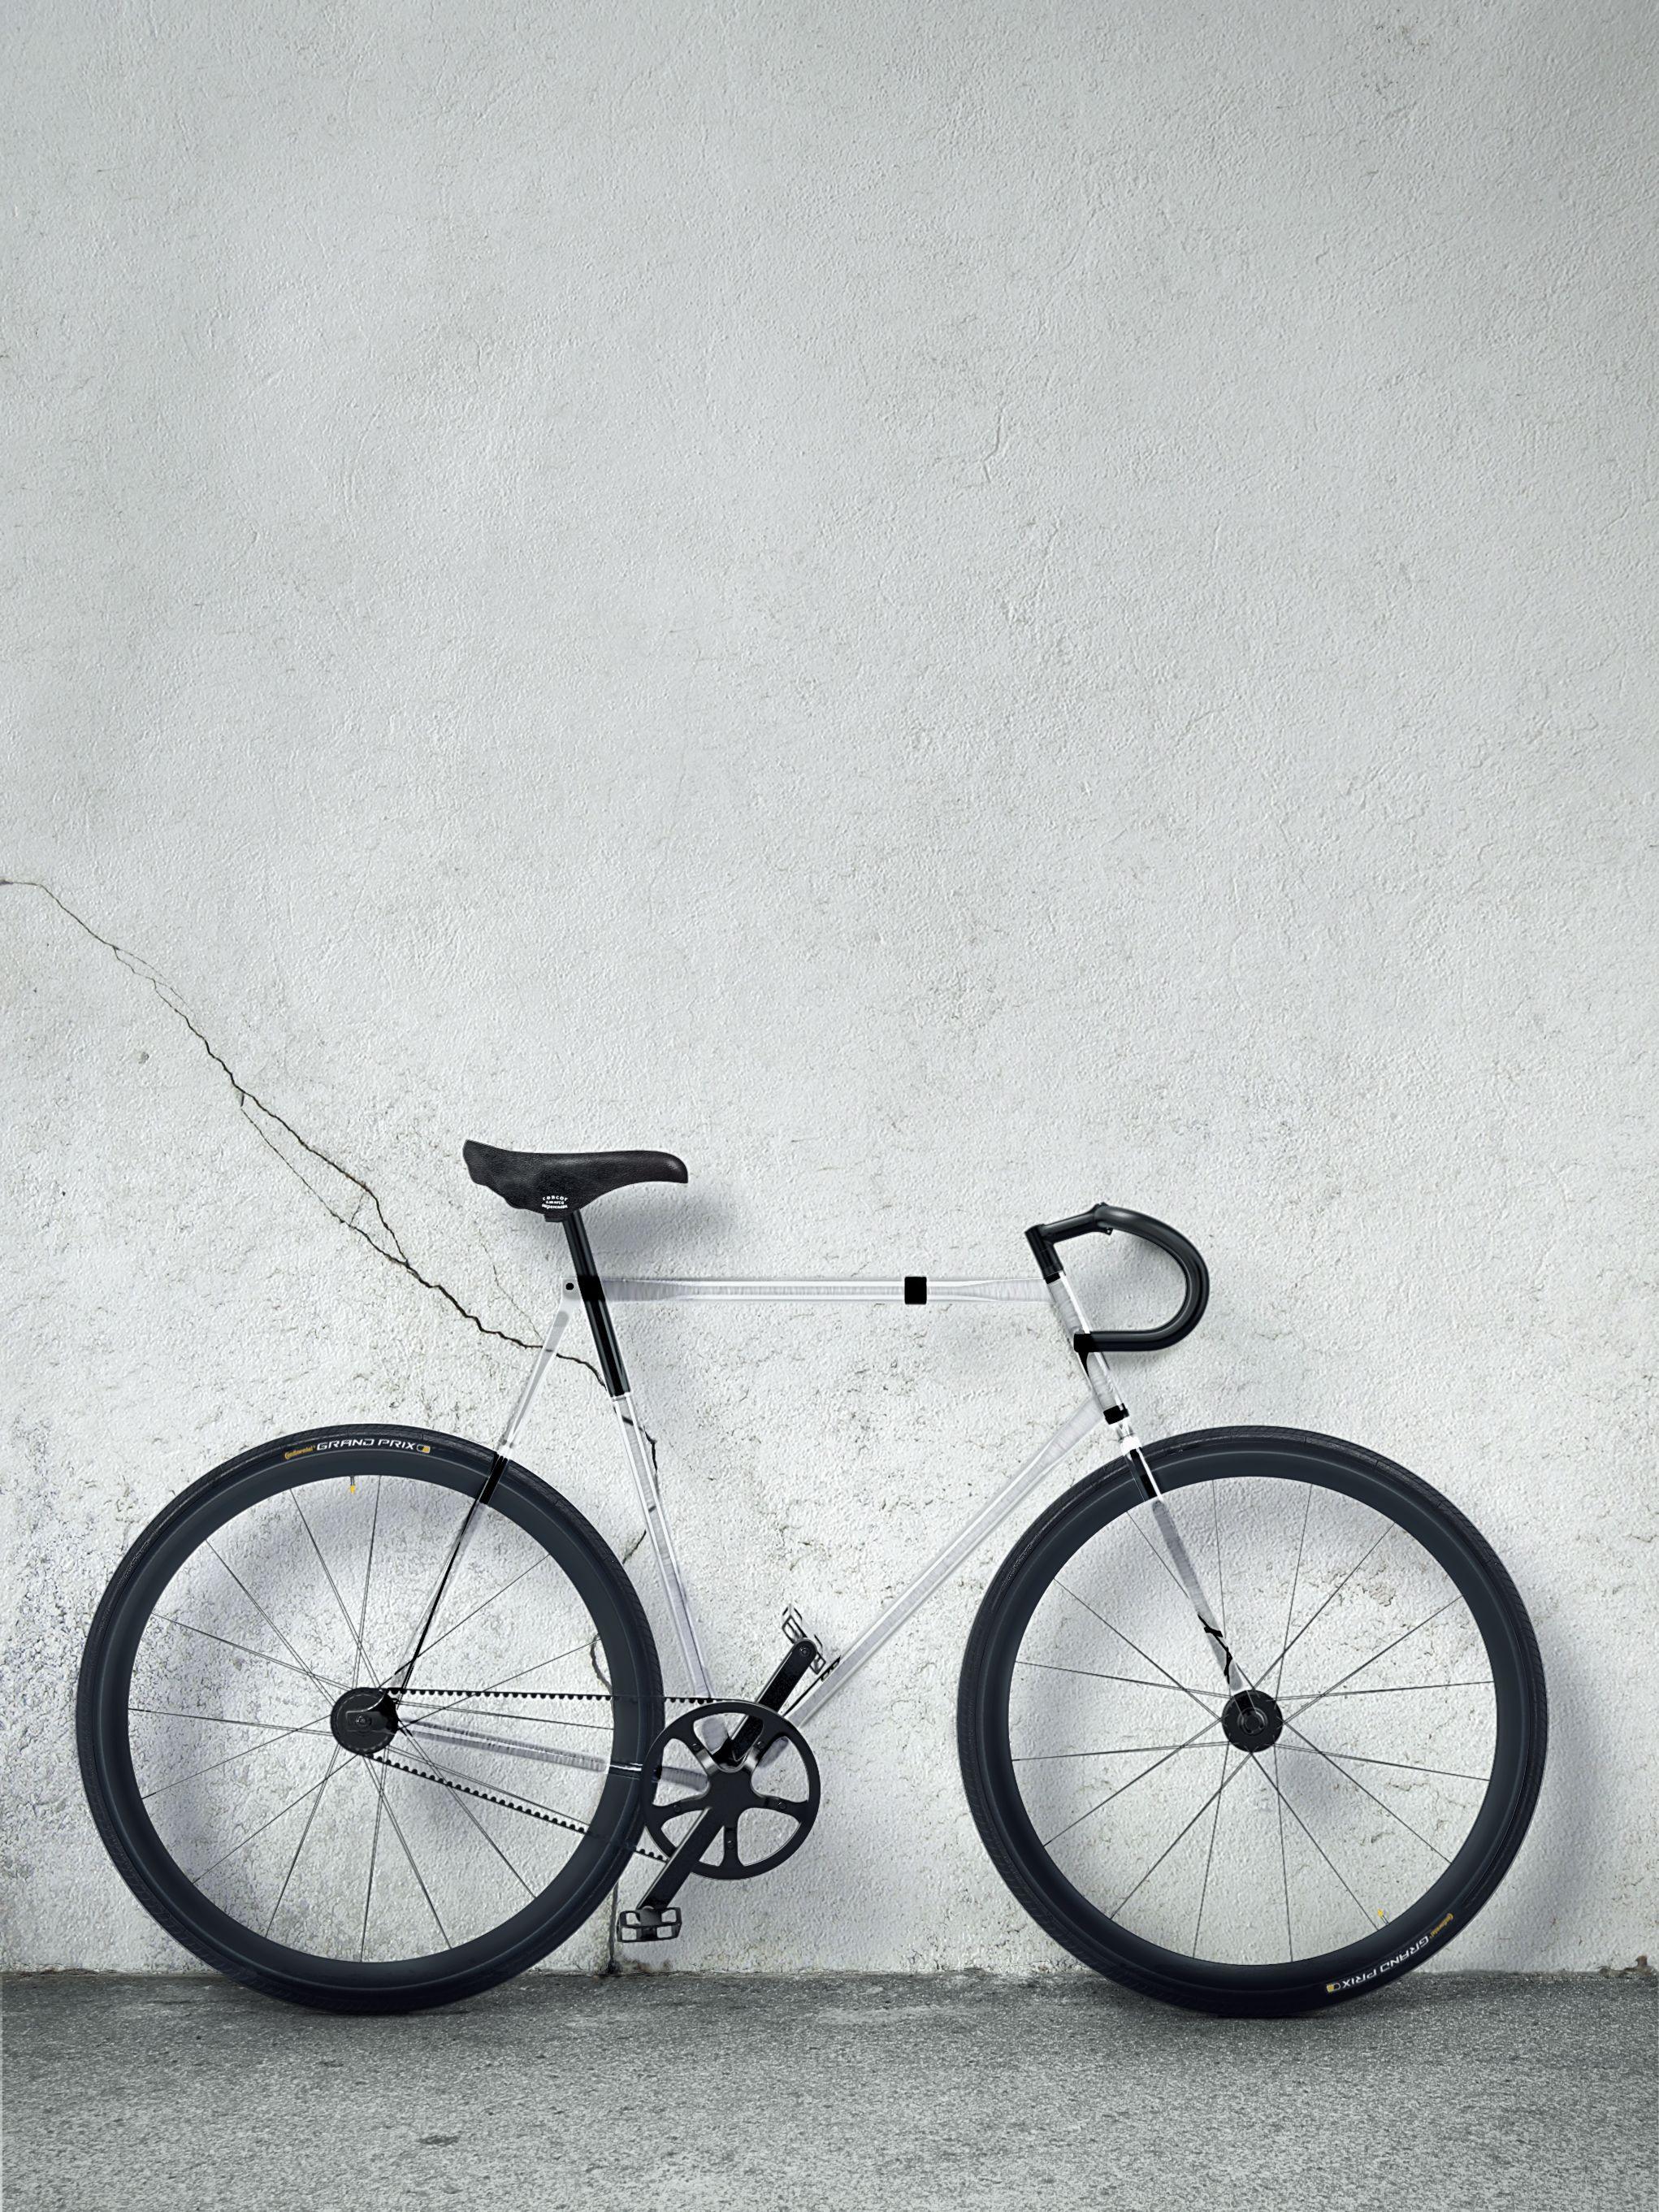 telaio in polimero trasparente 120926_Bike_ProjectShot_RS